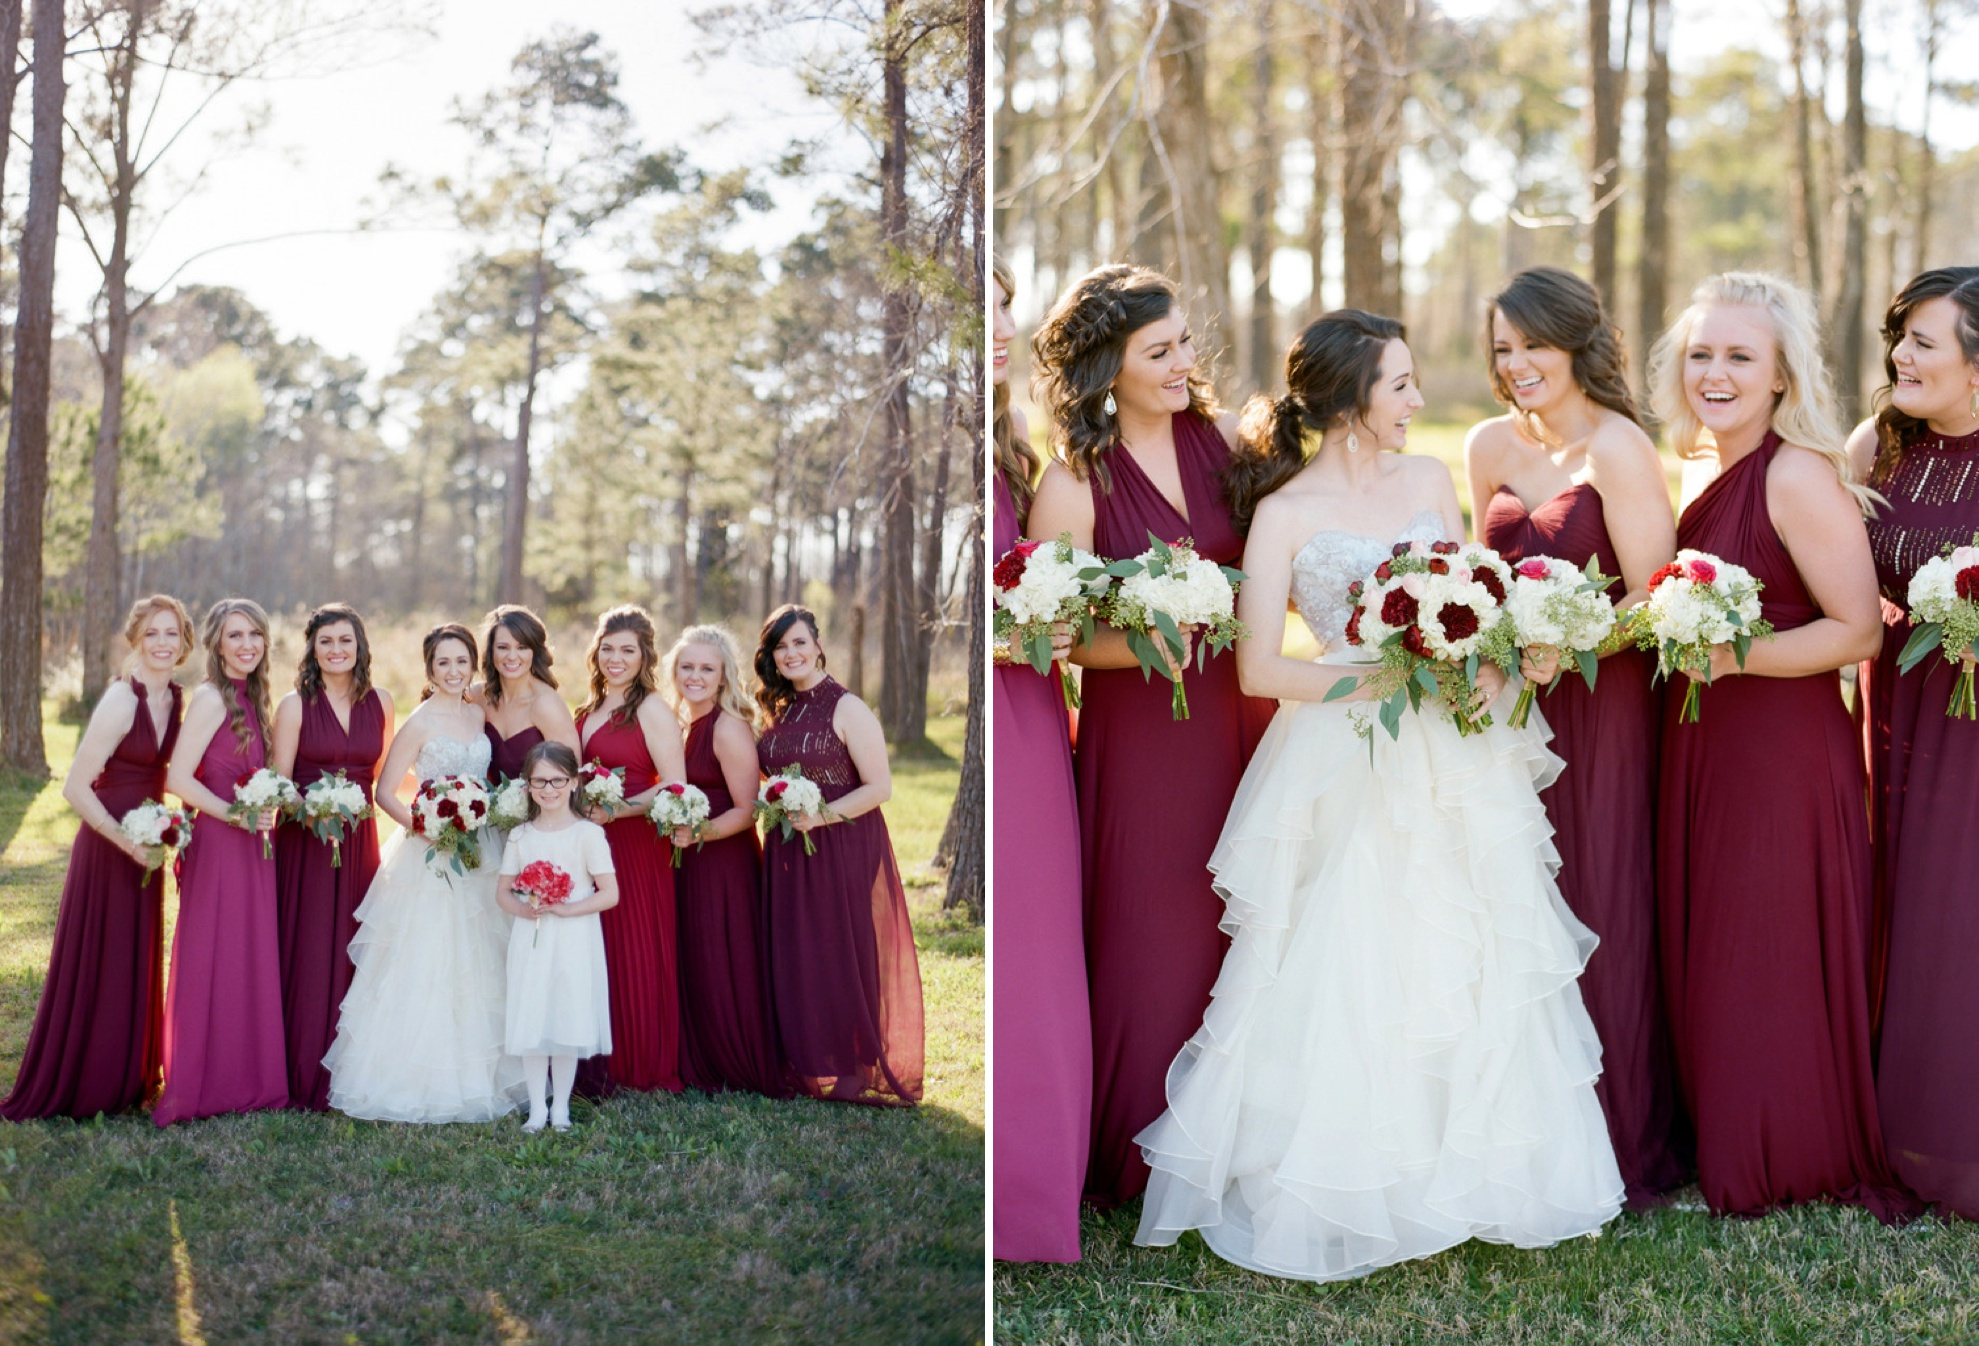 Tuscan-Courtyard-Wedding-Venue-Texas-City-Ceremony-Reception-Photographer-Dana-Fernandez-Photography-22.jpg